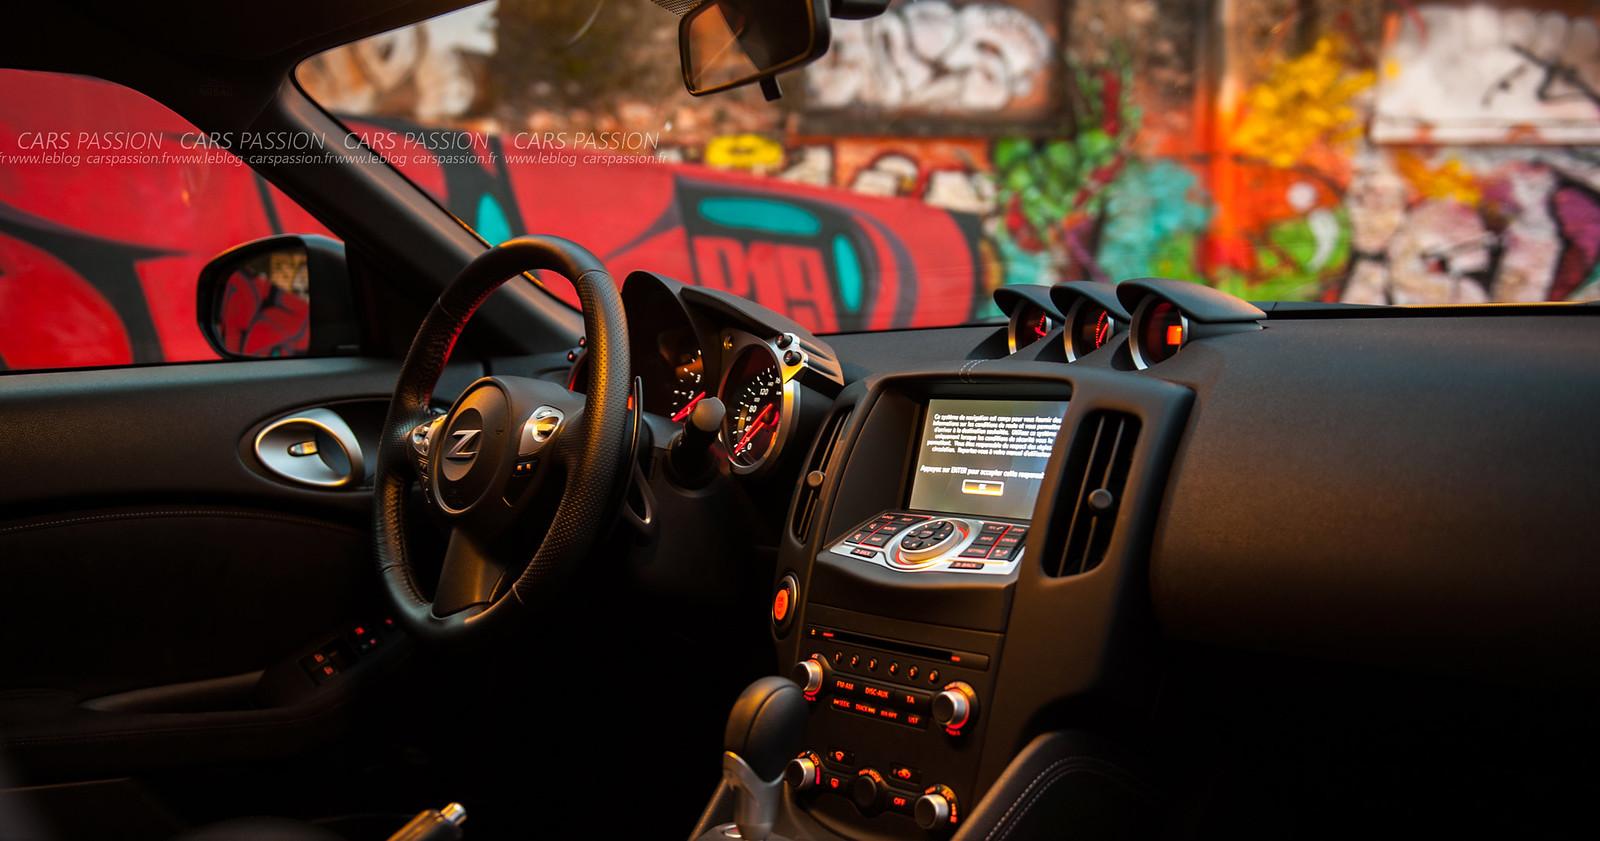 Nissan 370z essai auto sportive 2017 Blog cars passion